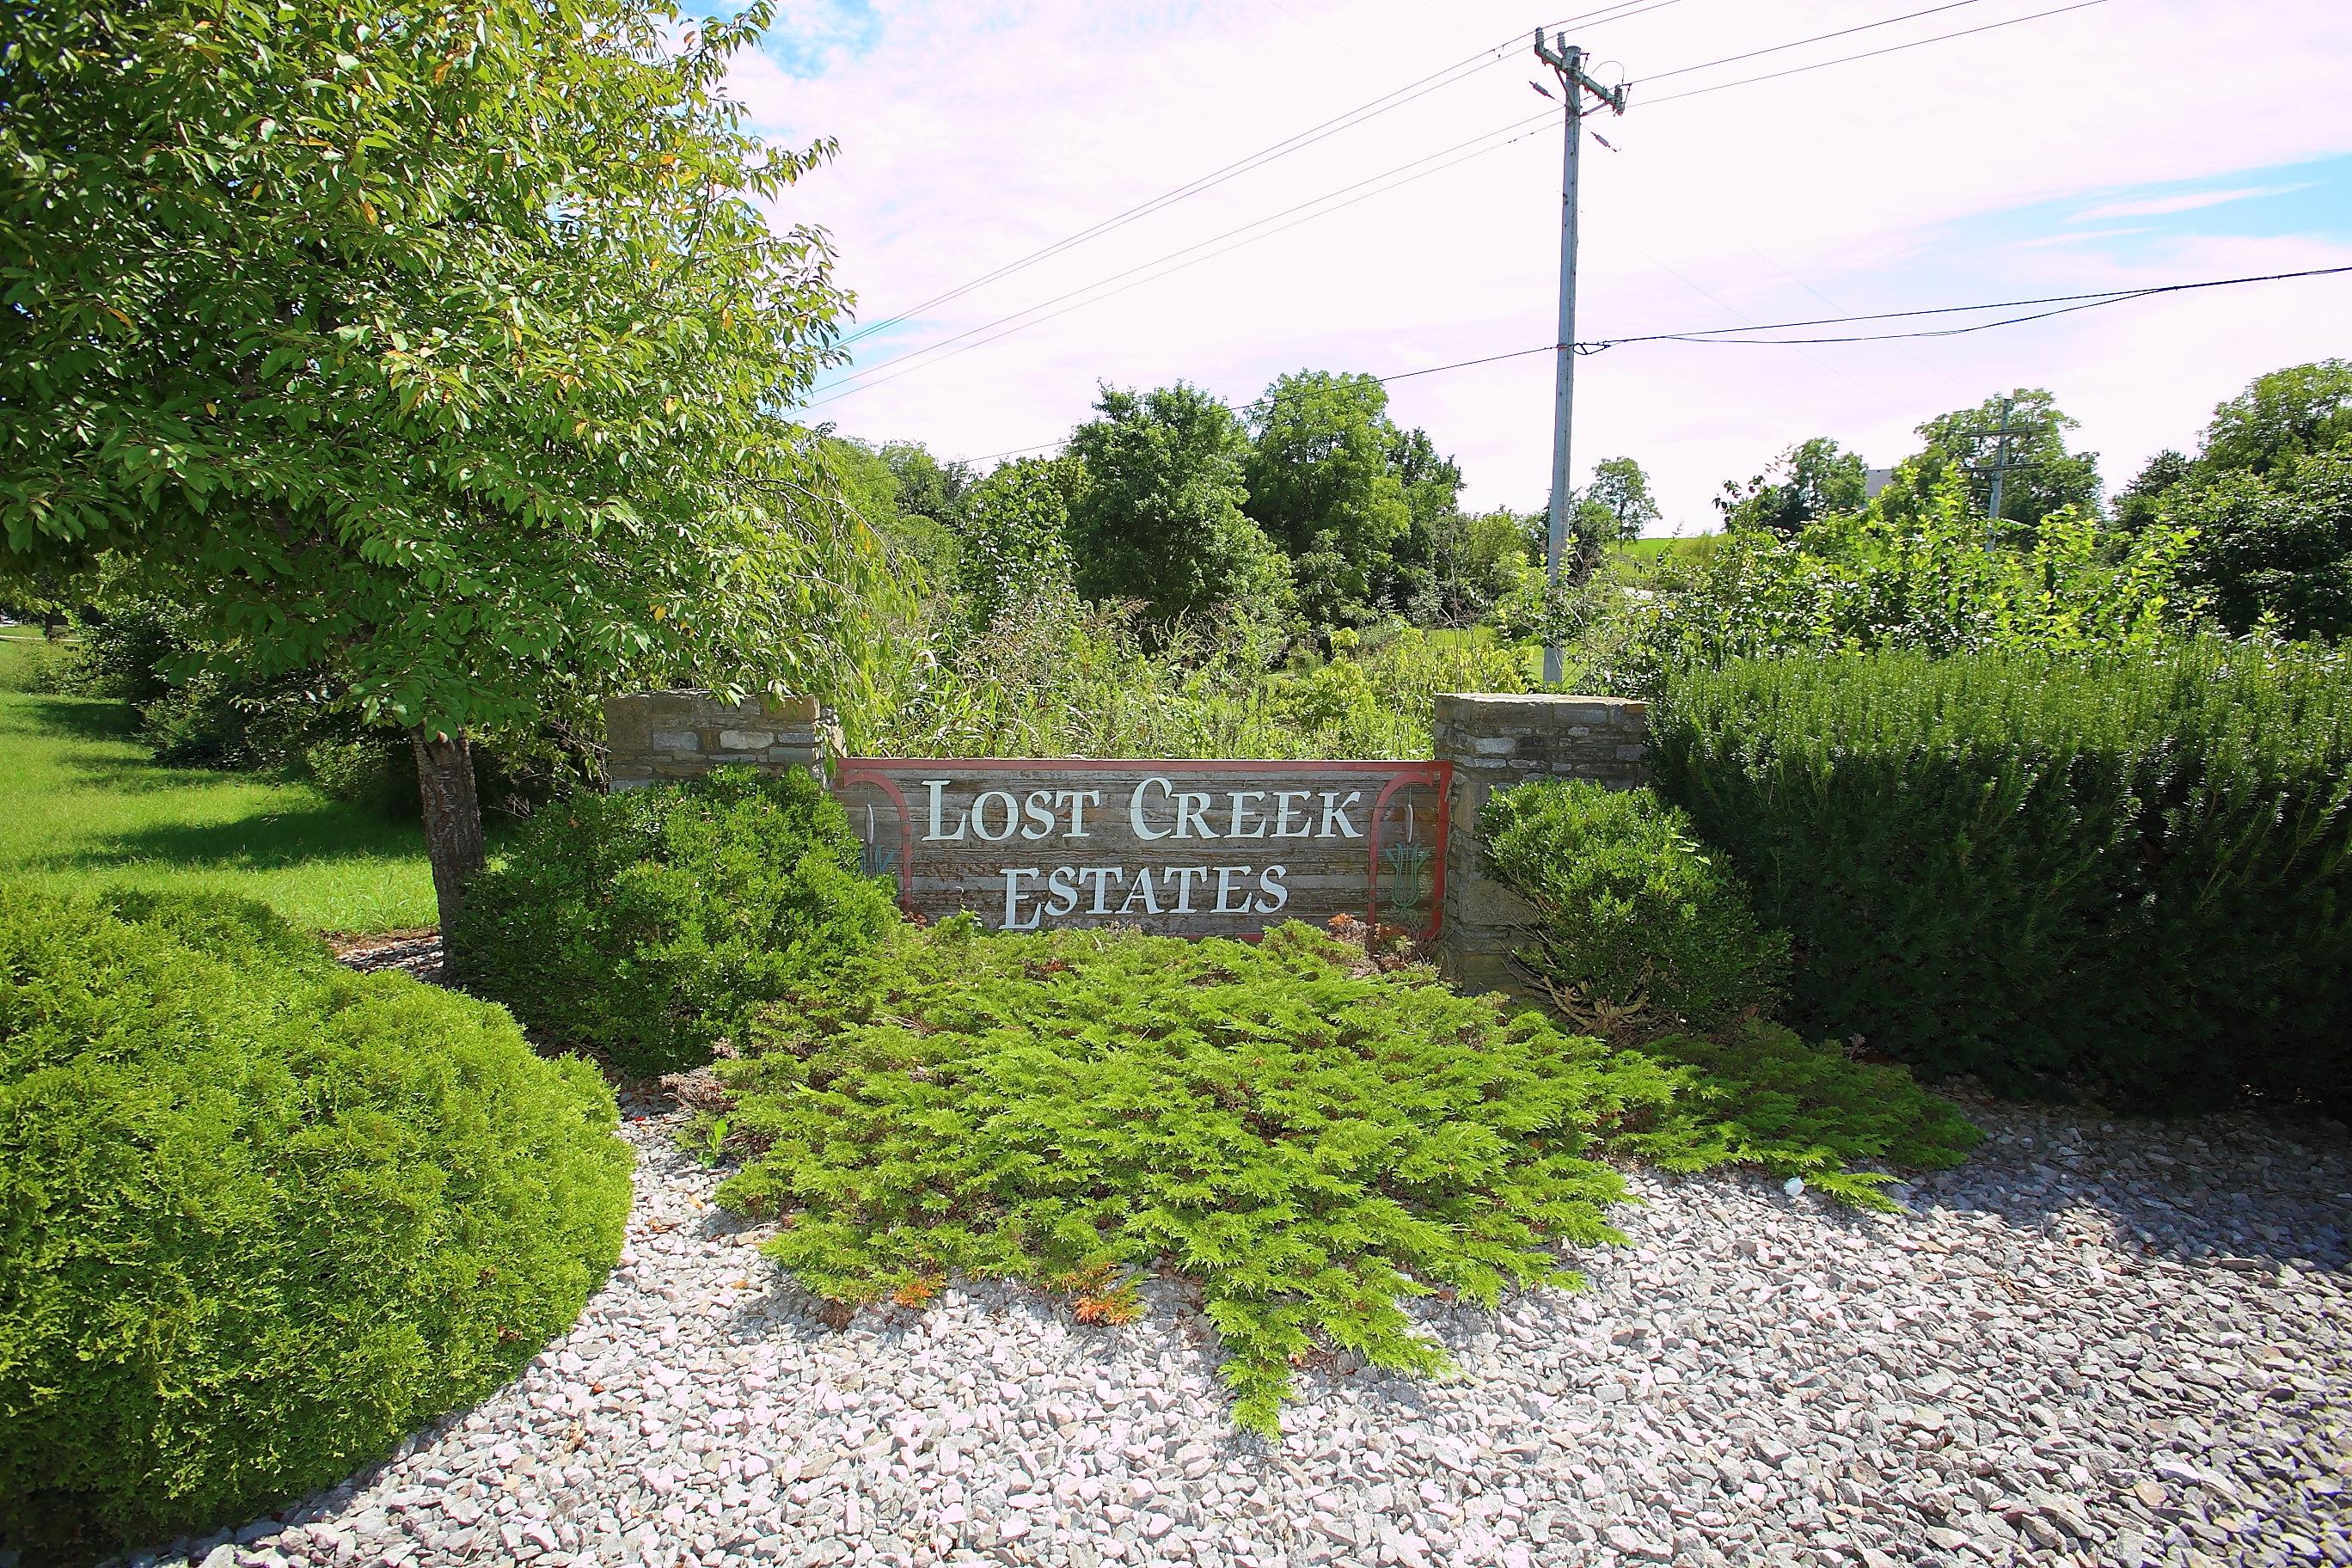 Lost Creek Estates